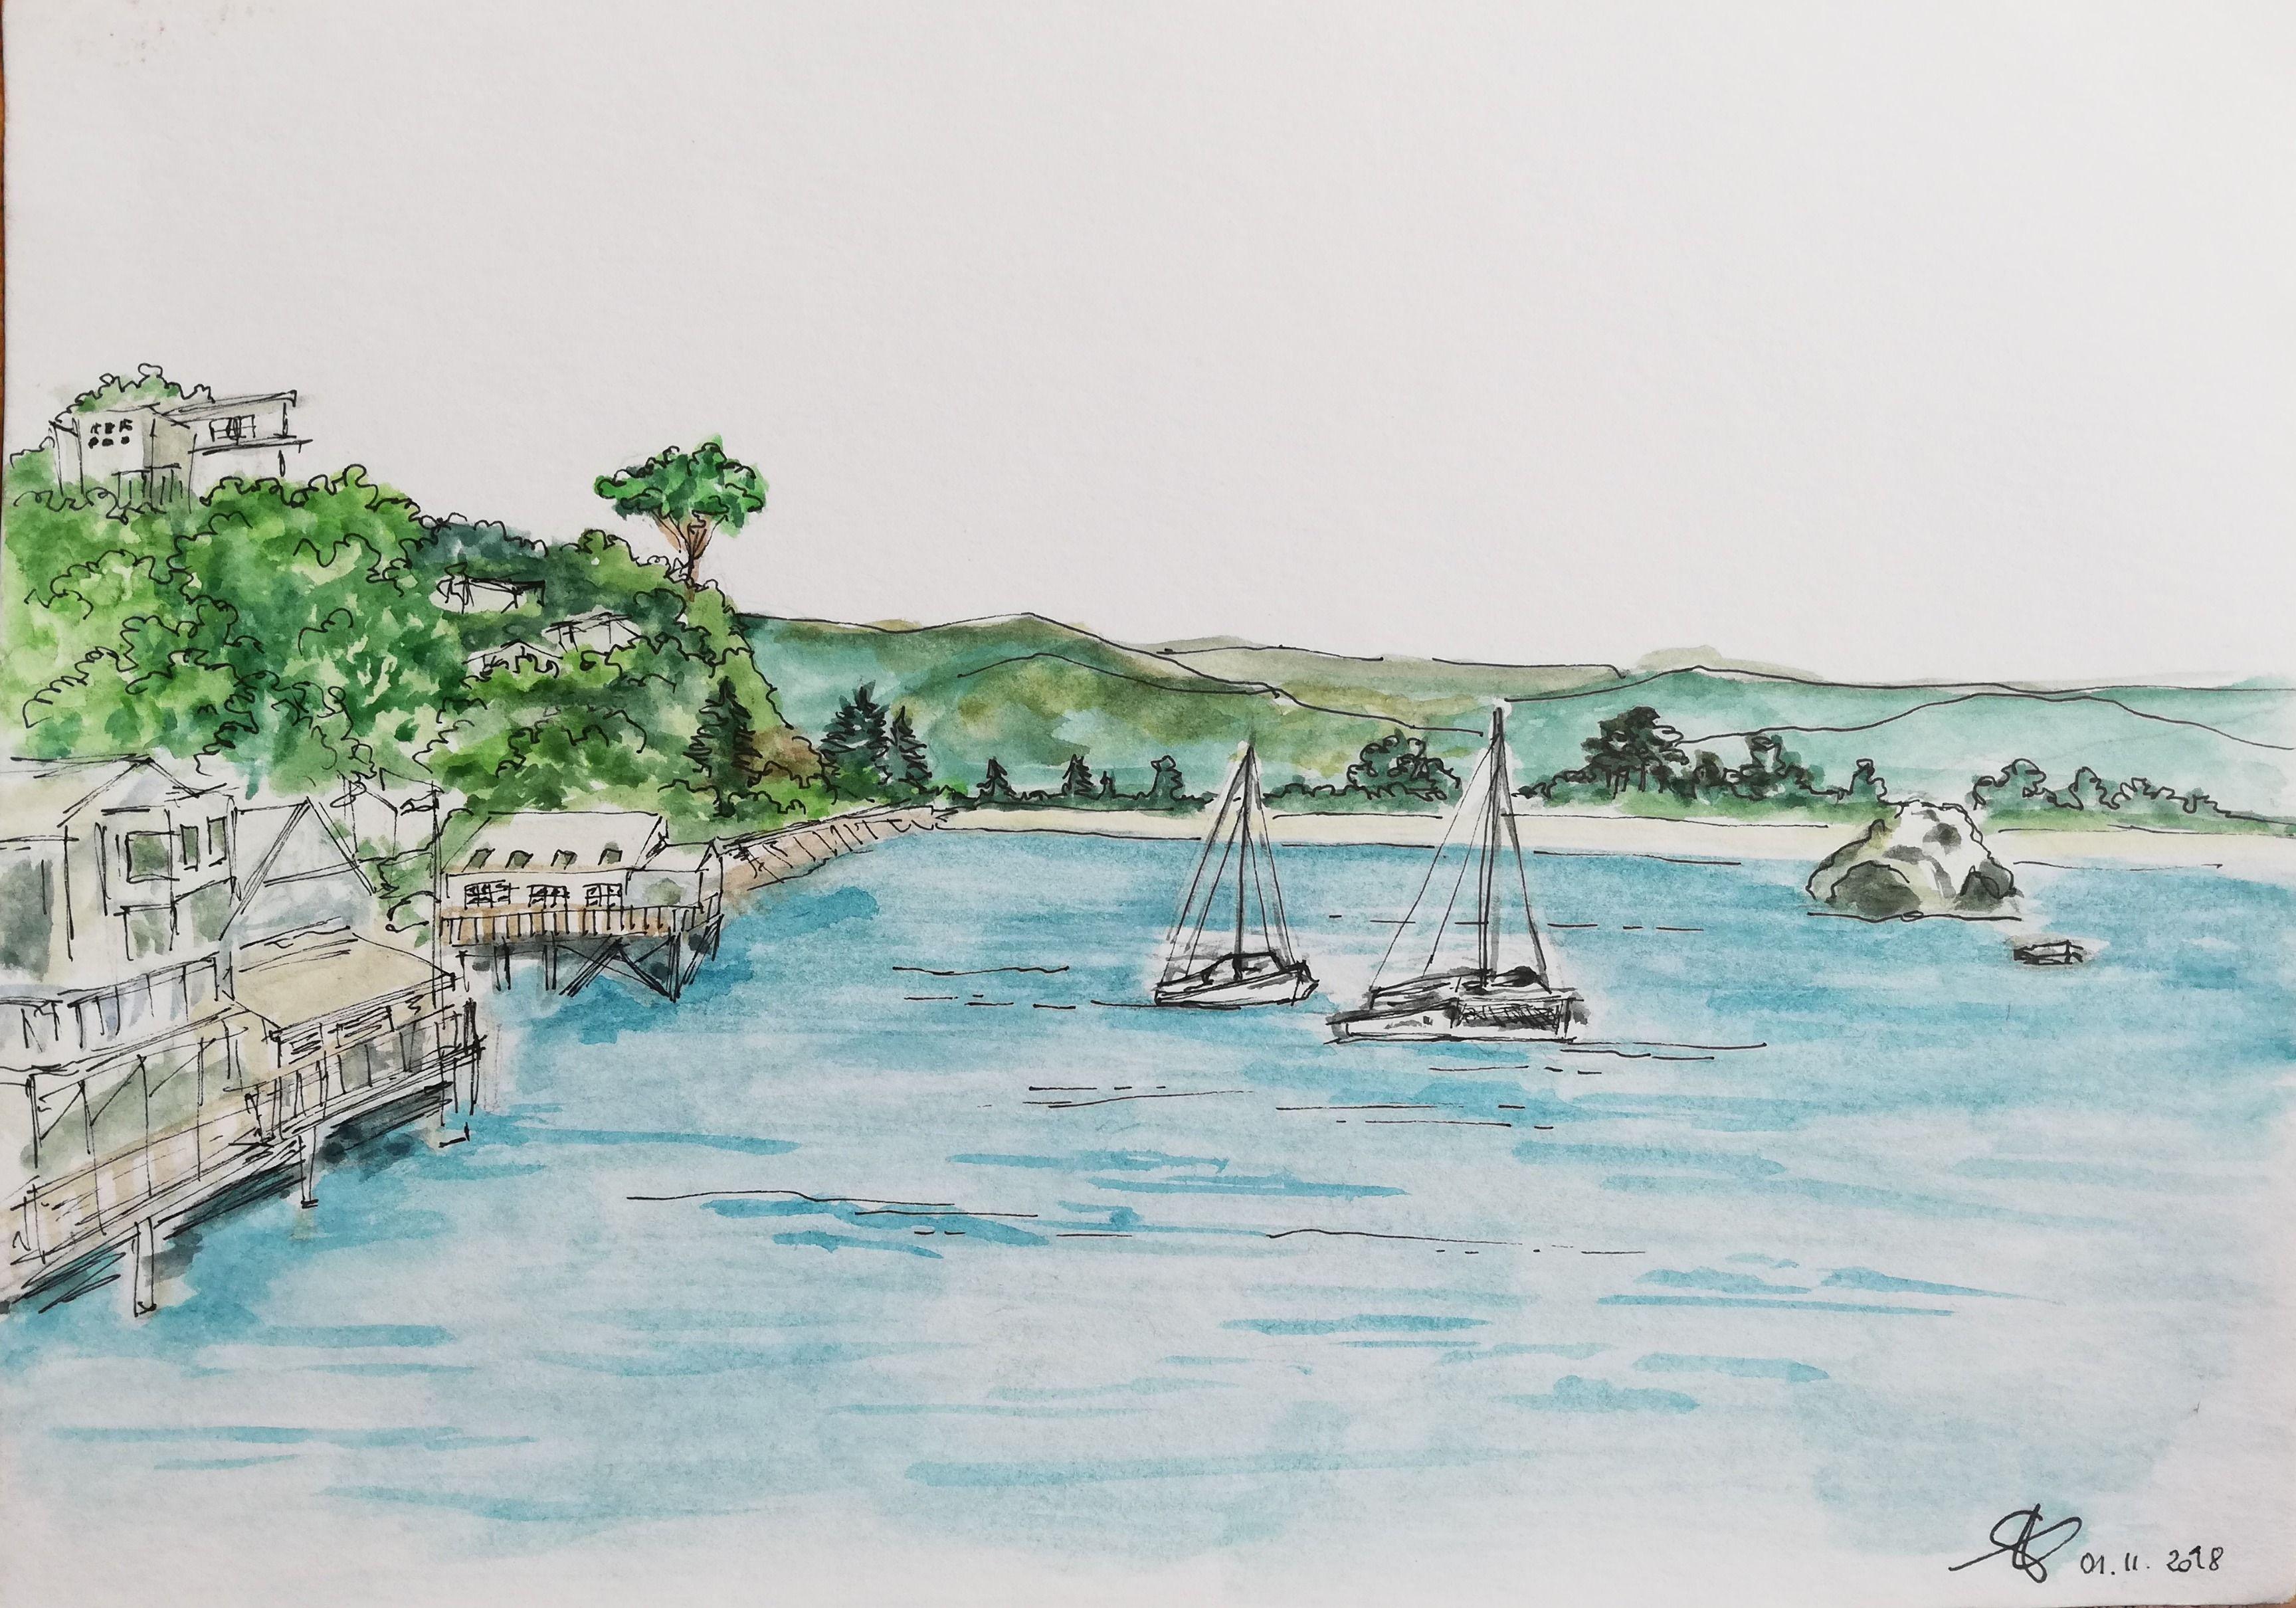 Josee Prudhomme Voler Aquarelle Et Encre Watercolor Ink